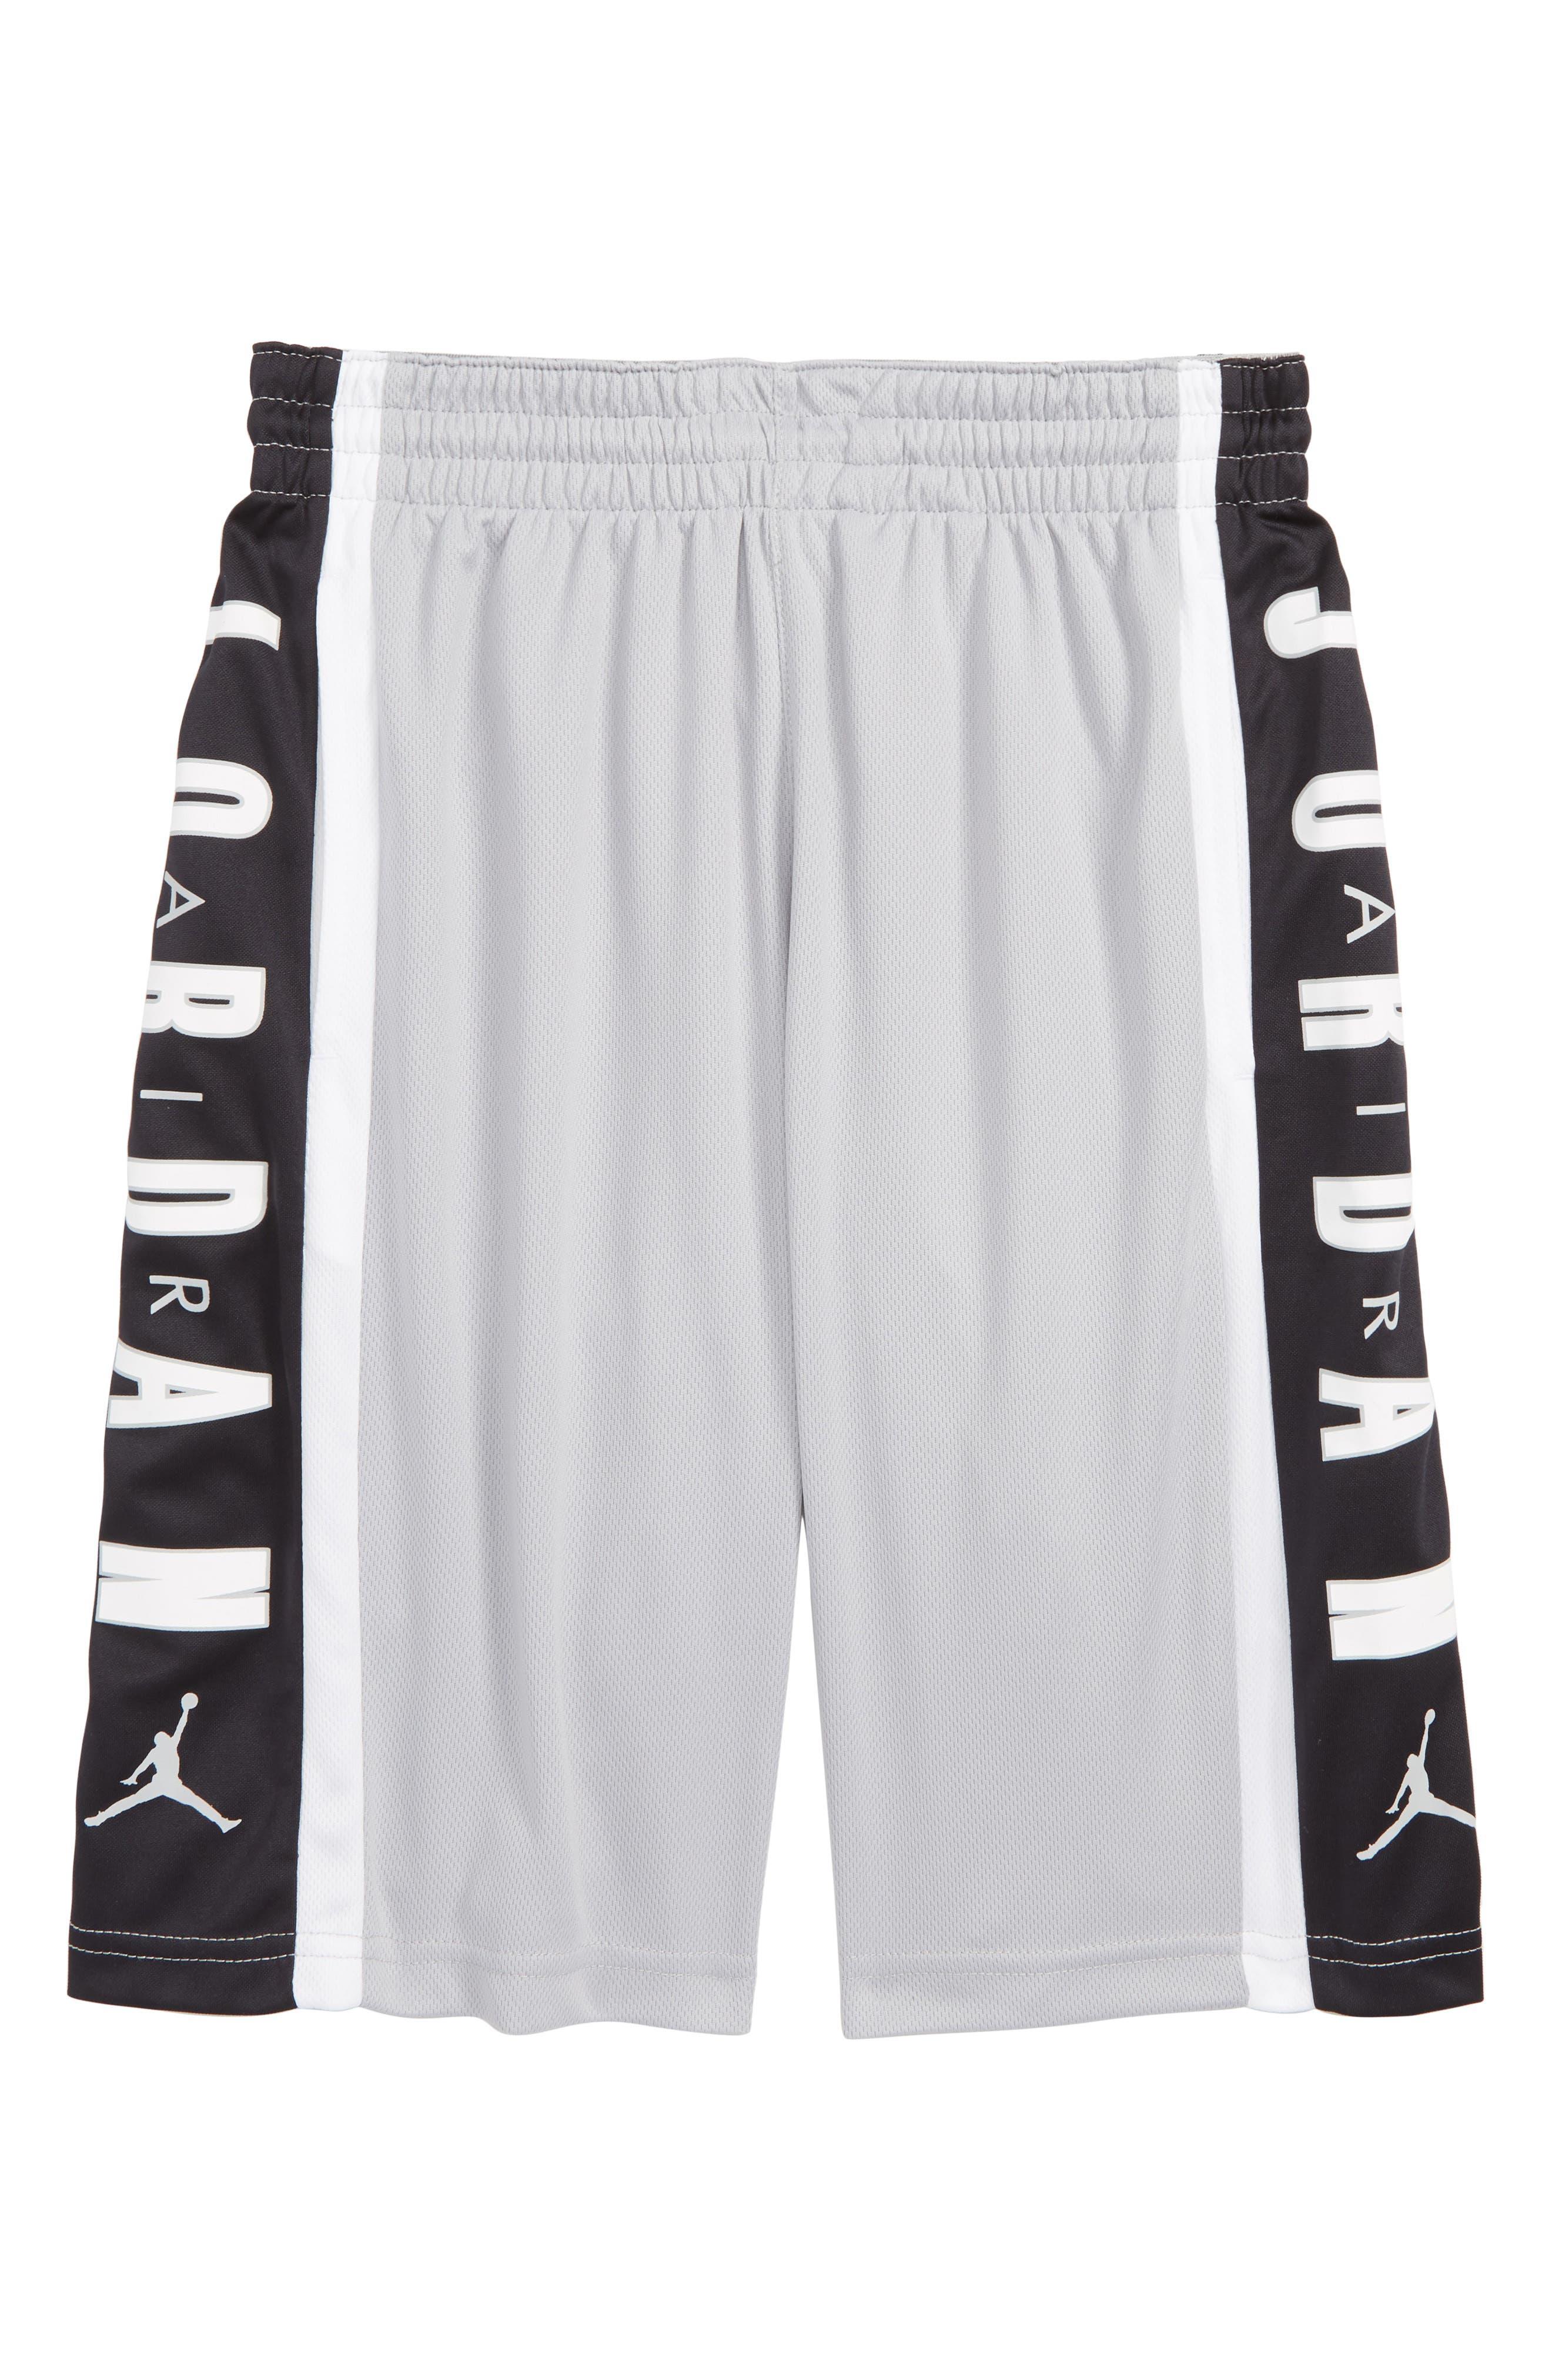 Rise3 Dri-FIT Basketball Shorts,                             Main thumbnail 1, color,                             LIGHT SMOKE GREY